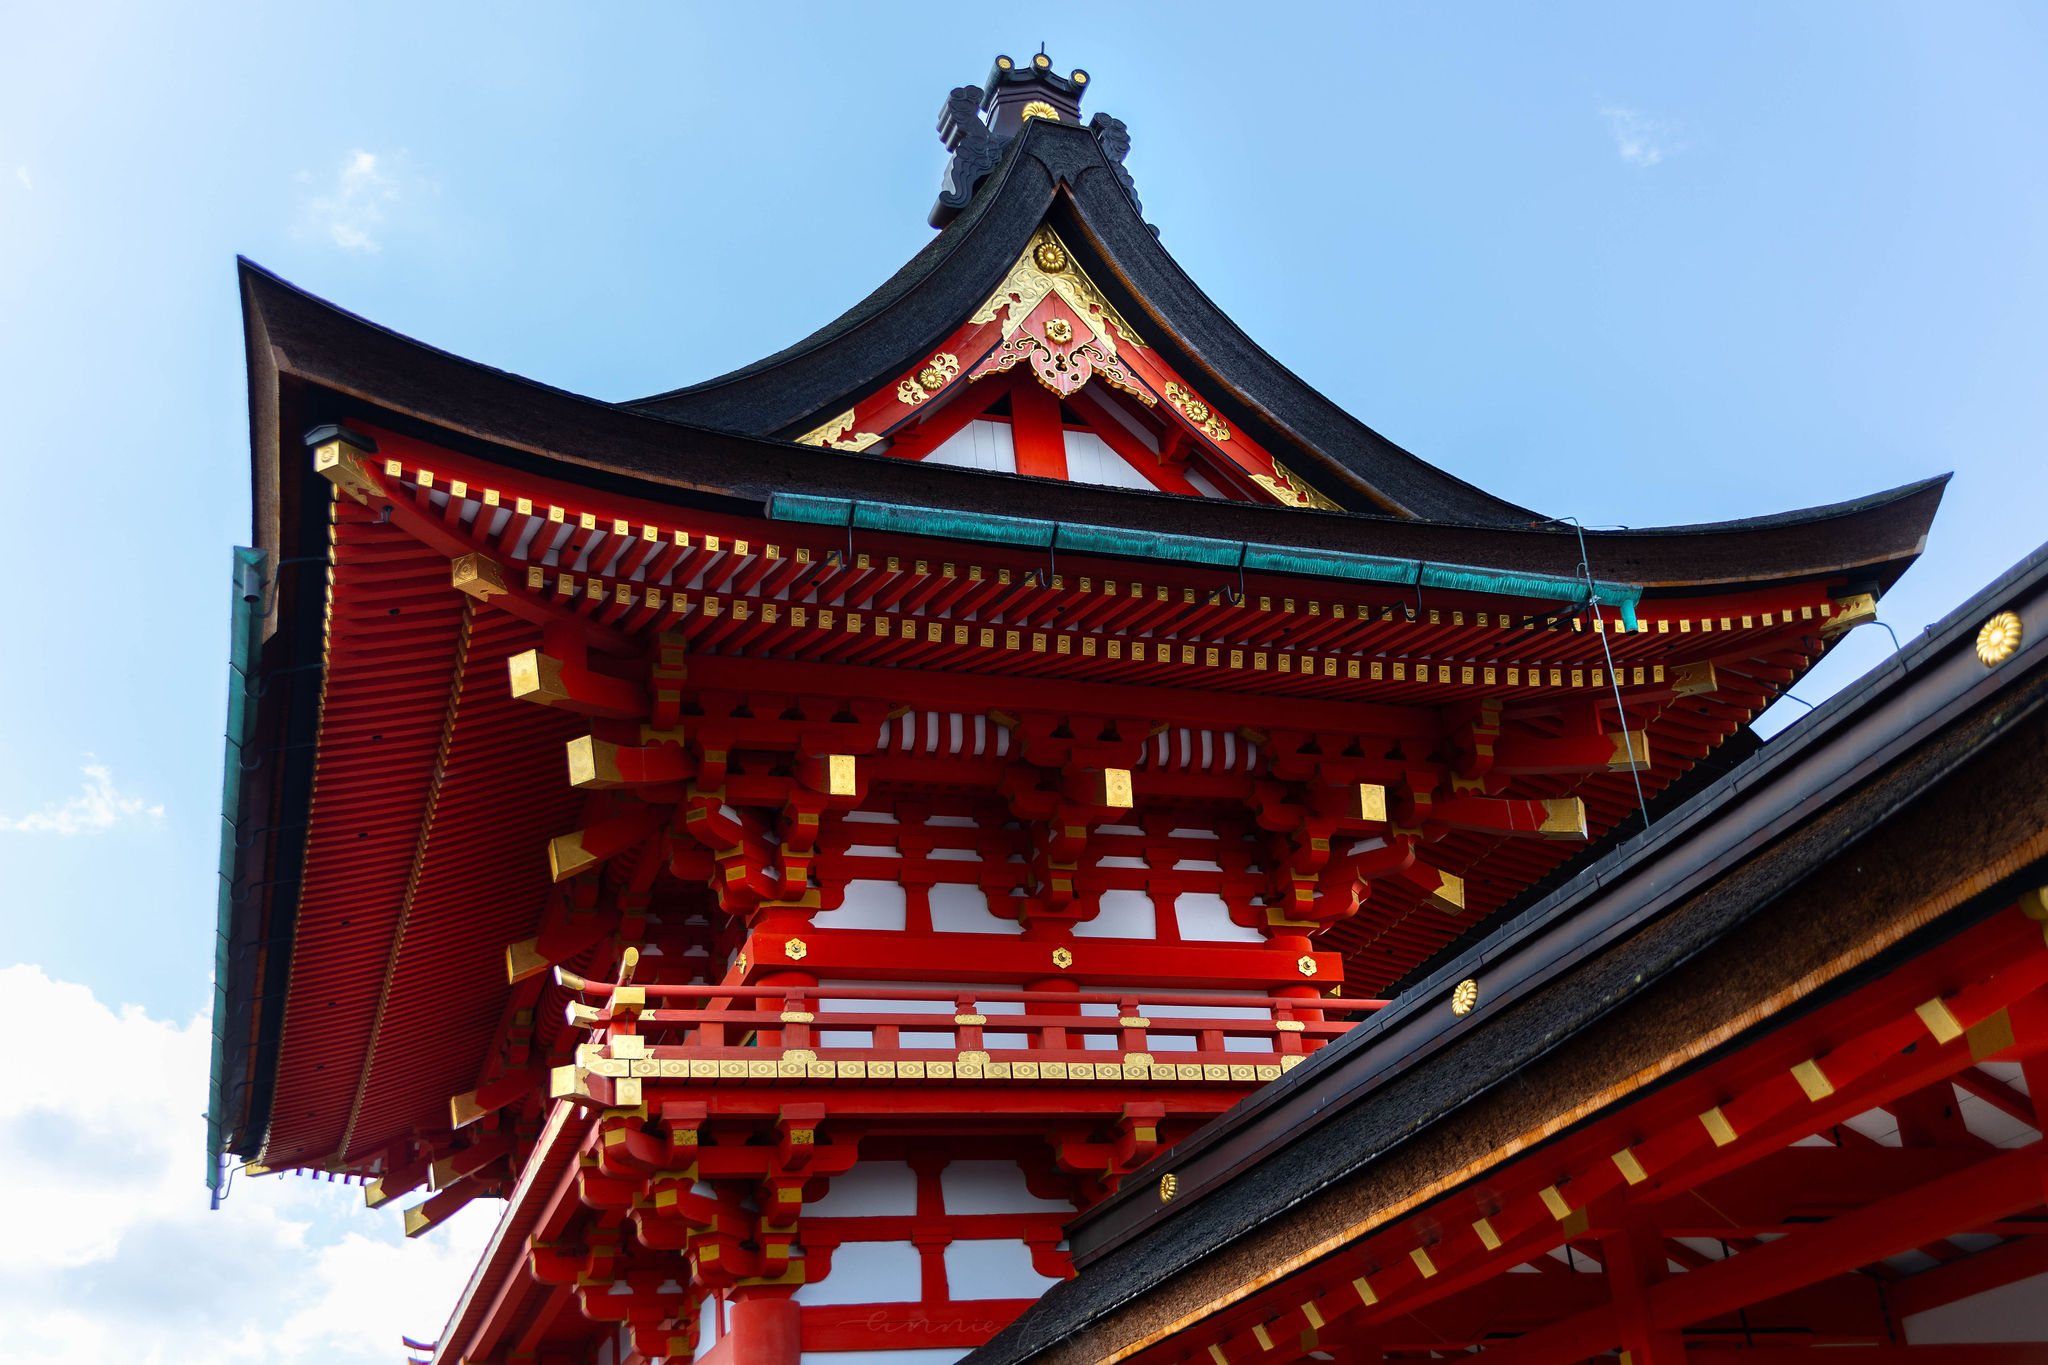 Main Shrine at Fushimi Inari Taisha Shrine 10,000 Red Vermillion Torii Gates in Kyoto Japan Mt. Inari Hiking Path